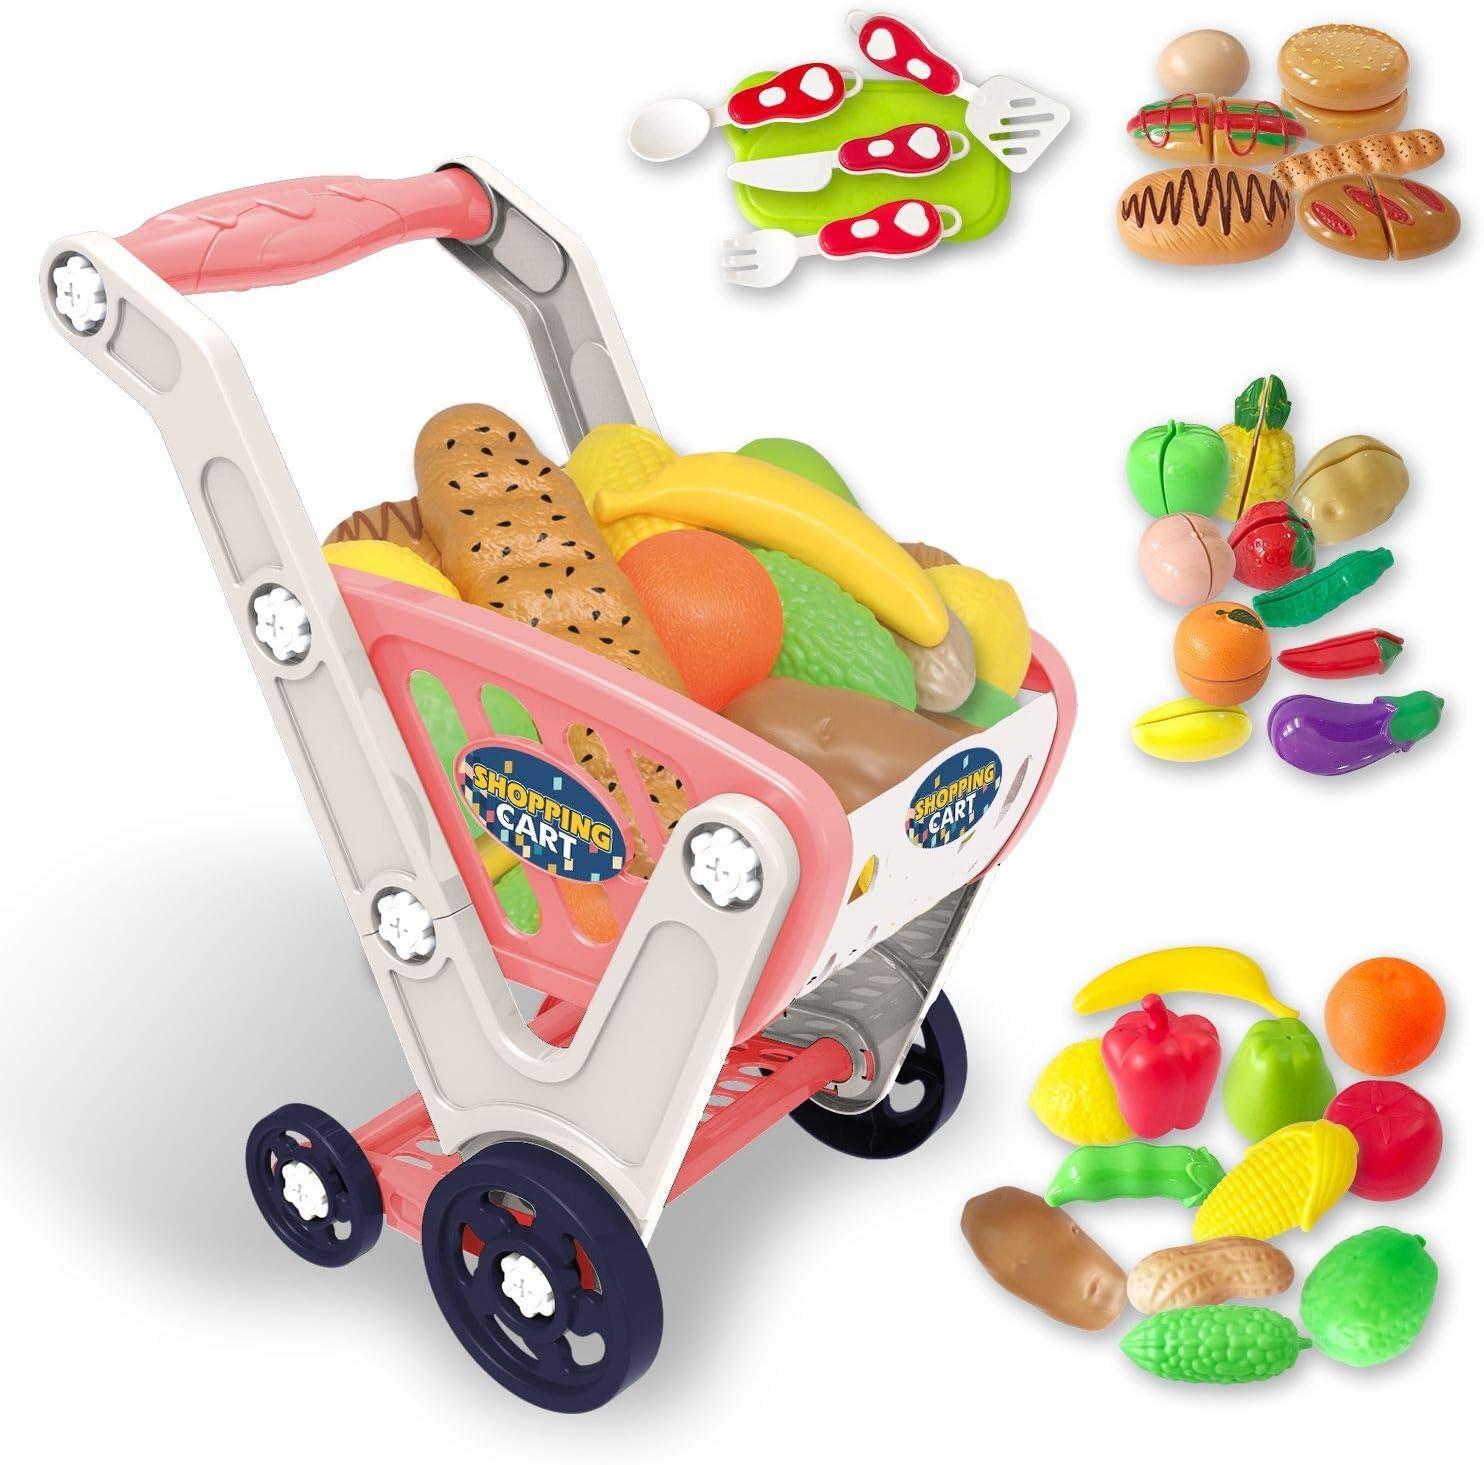 LADUO Large Kids Shopping cart Toy,Childrens Shopping Trolley Ba